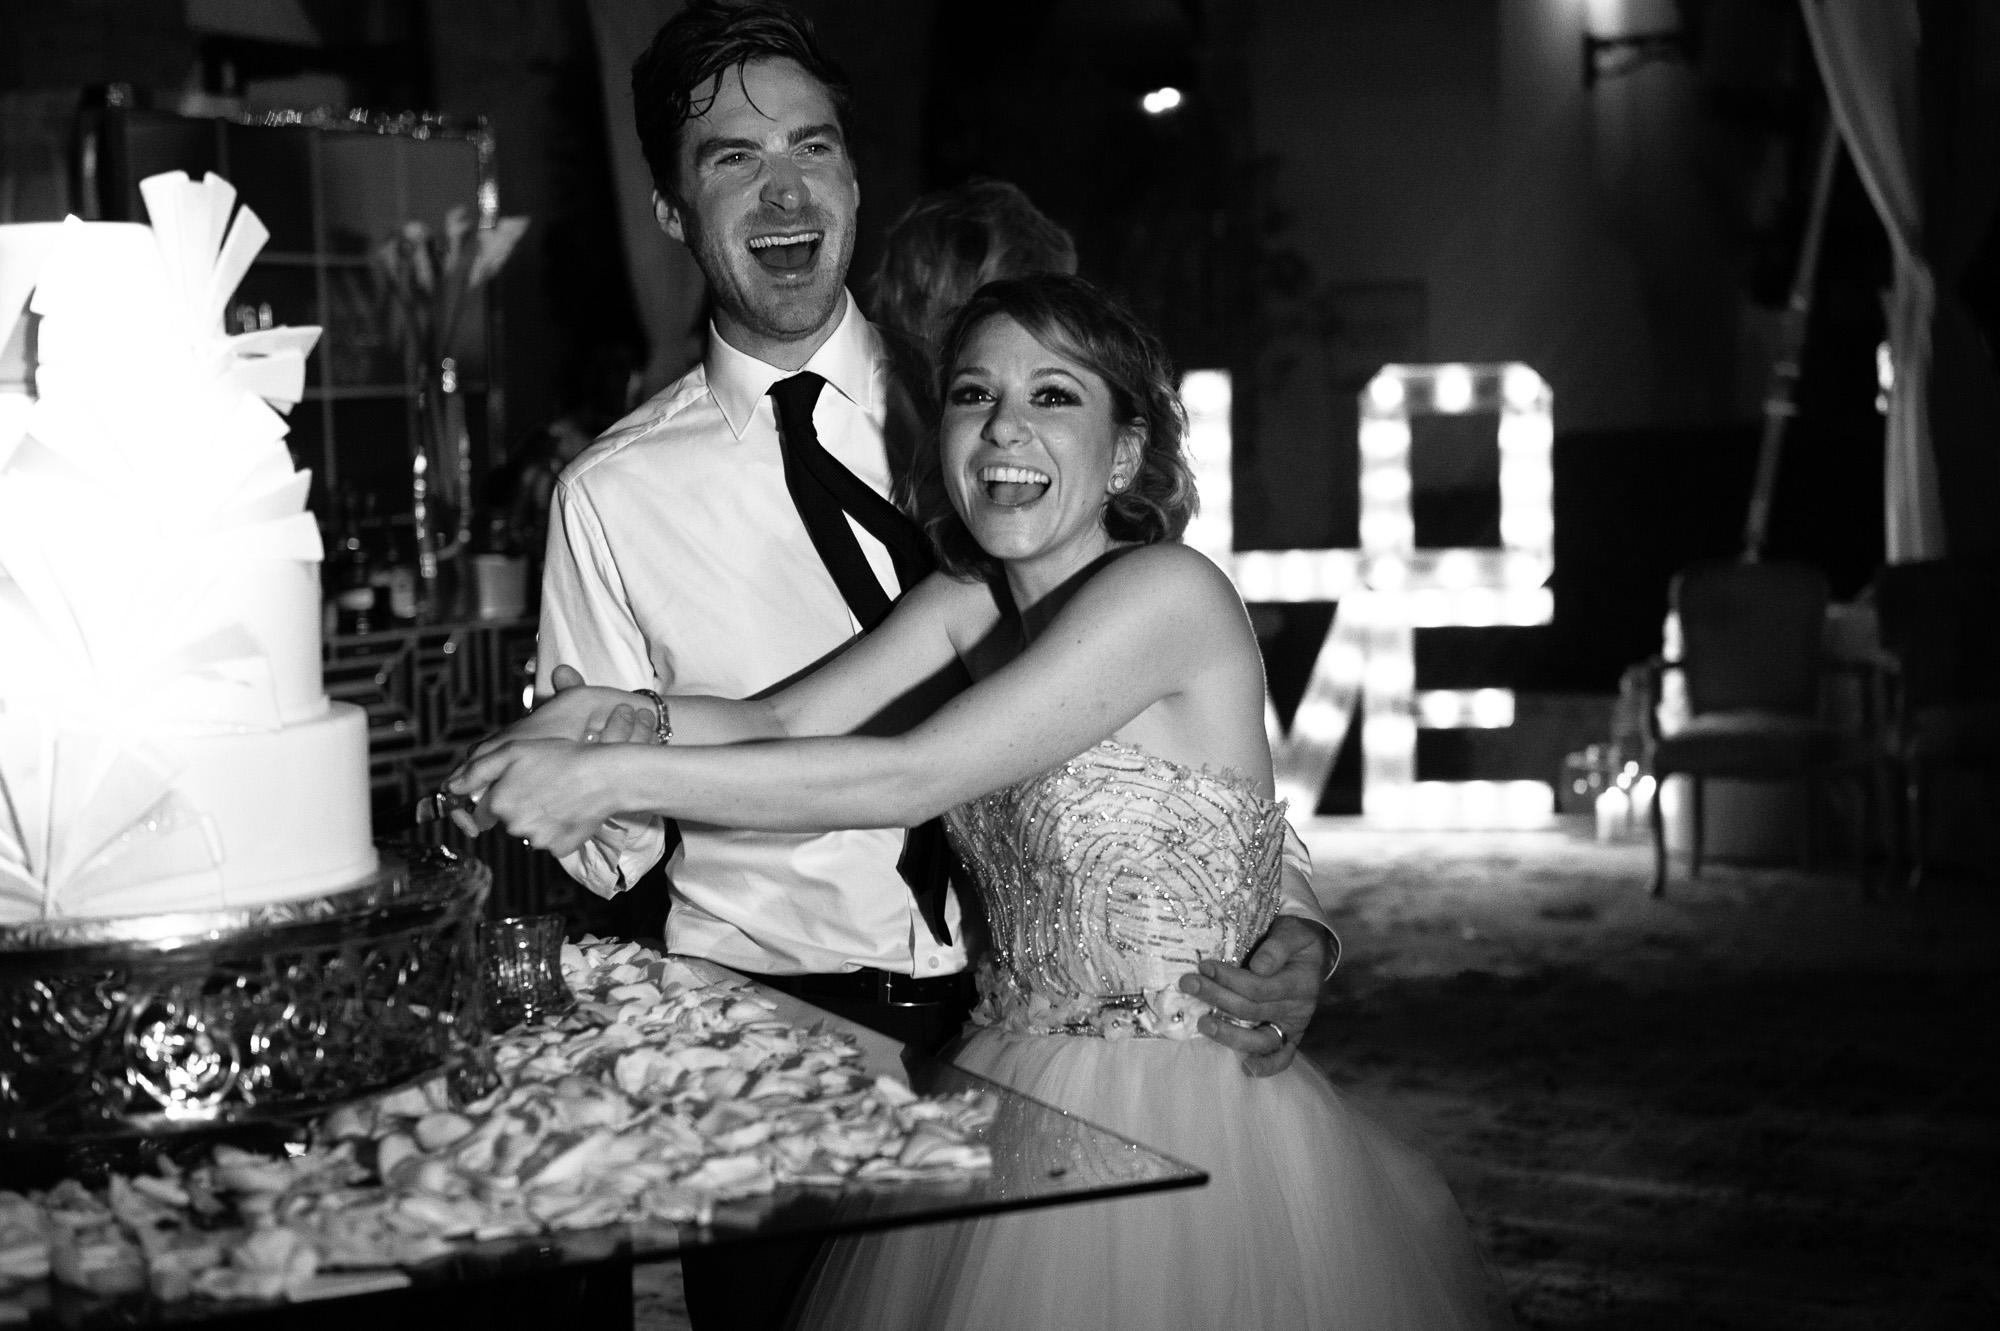 fisher-island-wedding-069.jpg